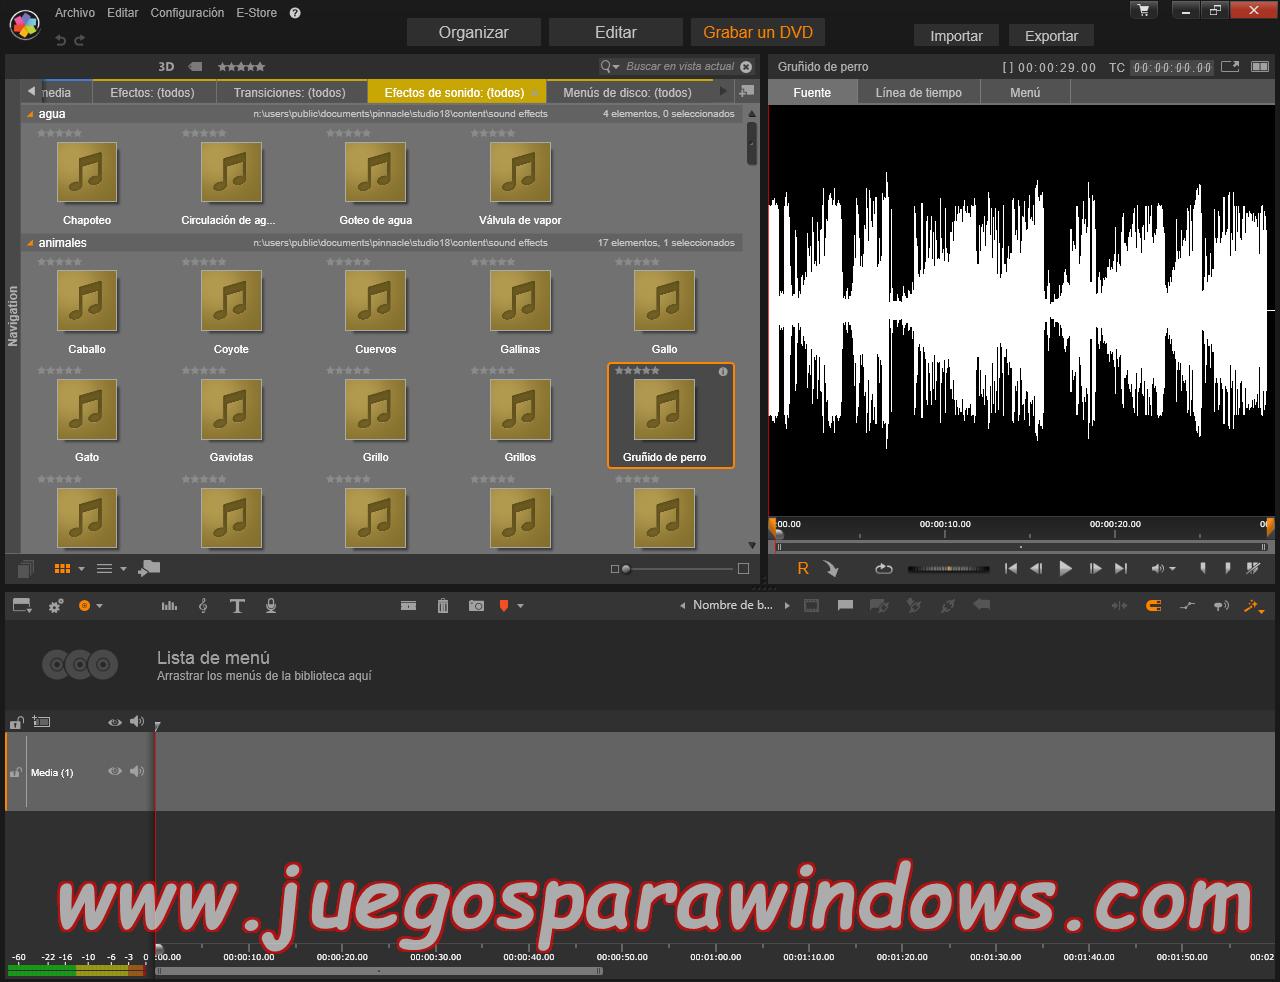 Pinnacle Studio Ultimate v18.0.1 Multilenguaje ESPAÑOL (CORE) 13